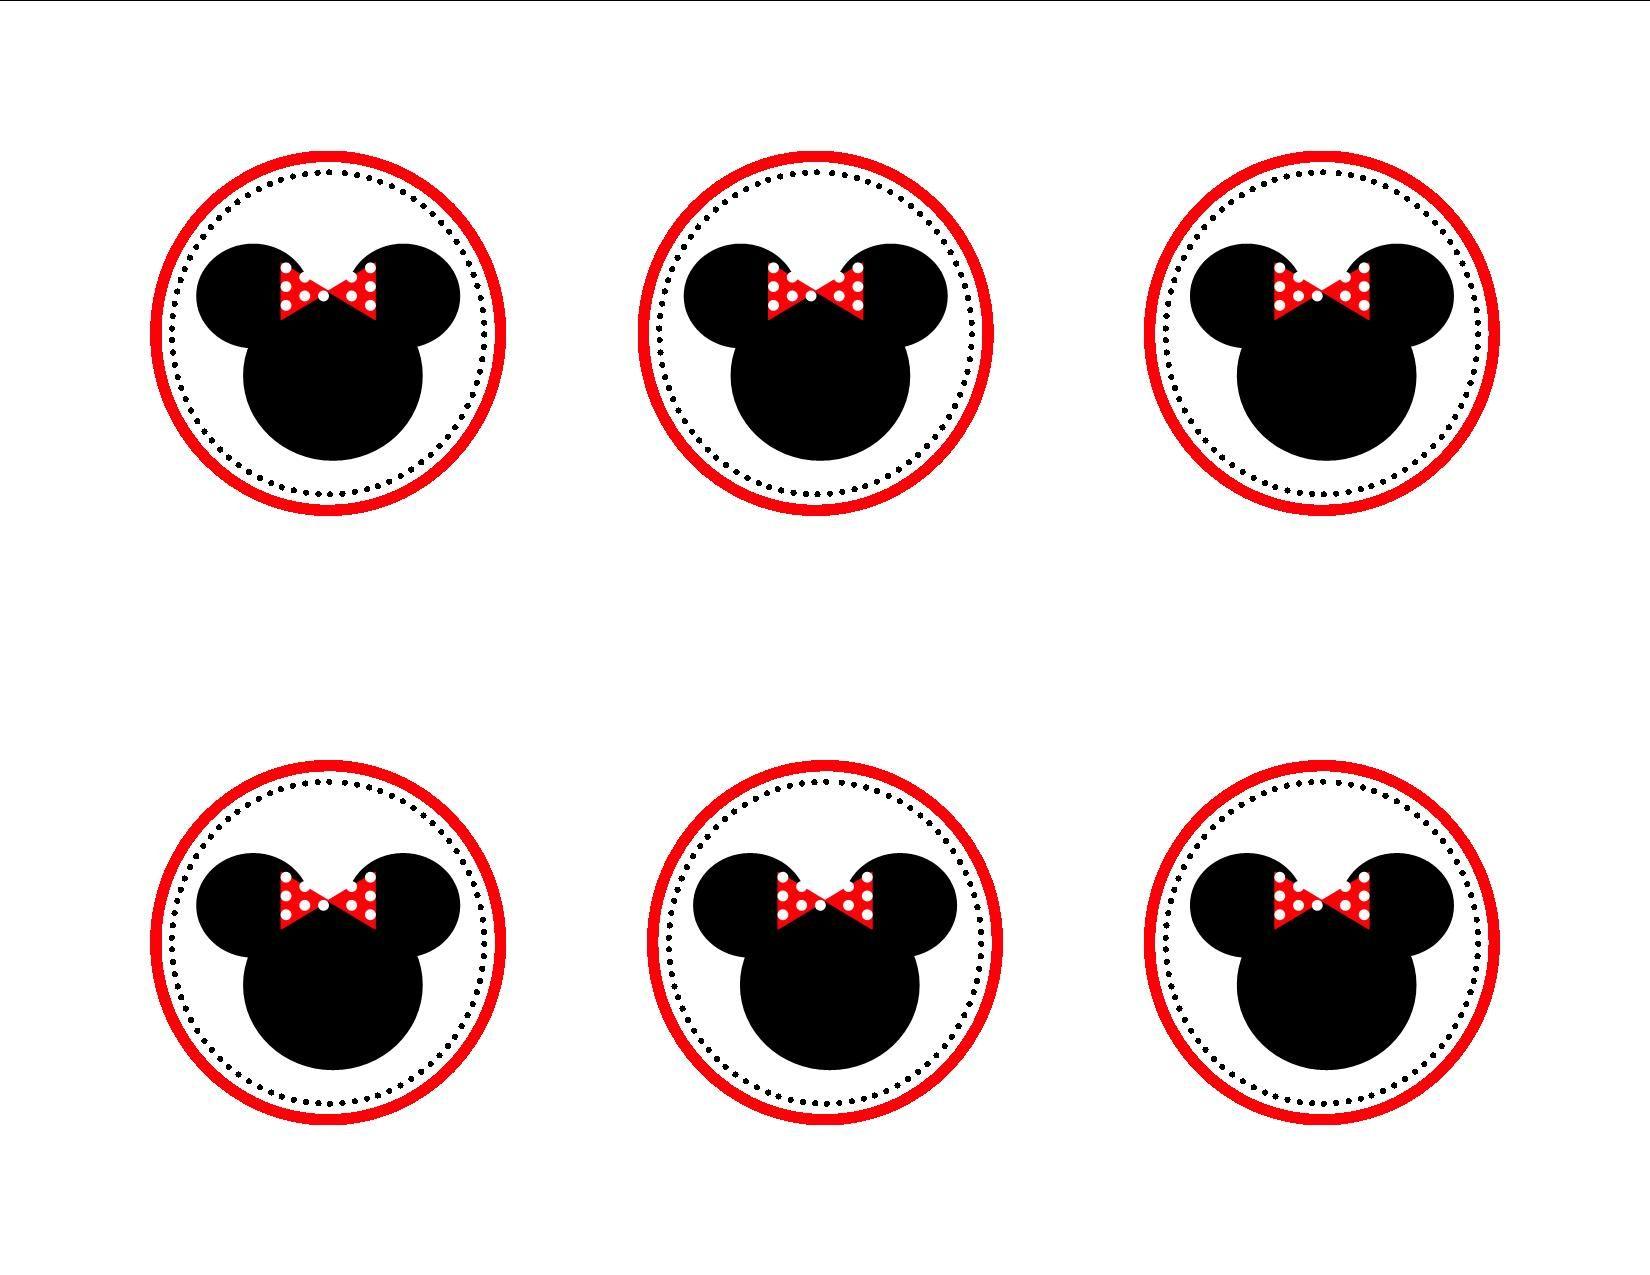 Rachel gibson minnie mouse cupcake topper templates can print it rachel gibson minnie mouse cupcake topper templates can print it too biocorpaavc